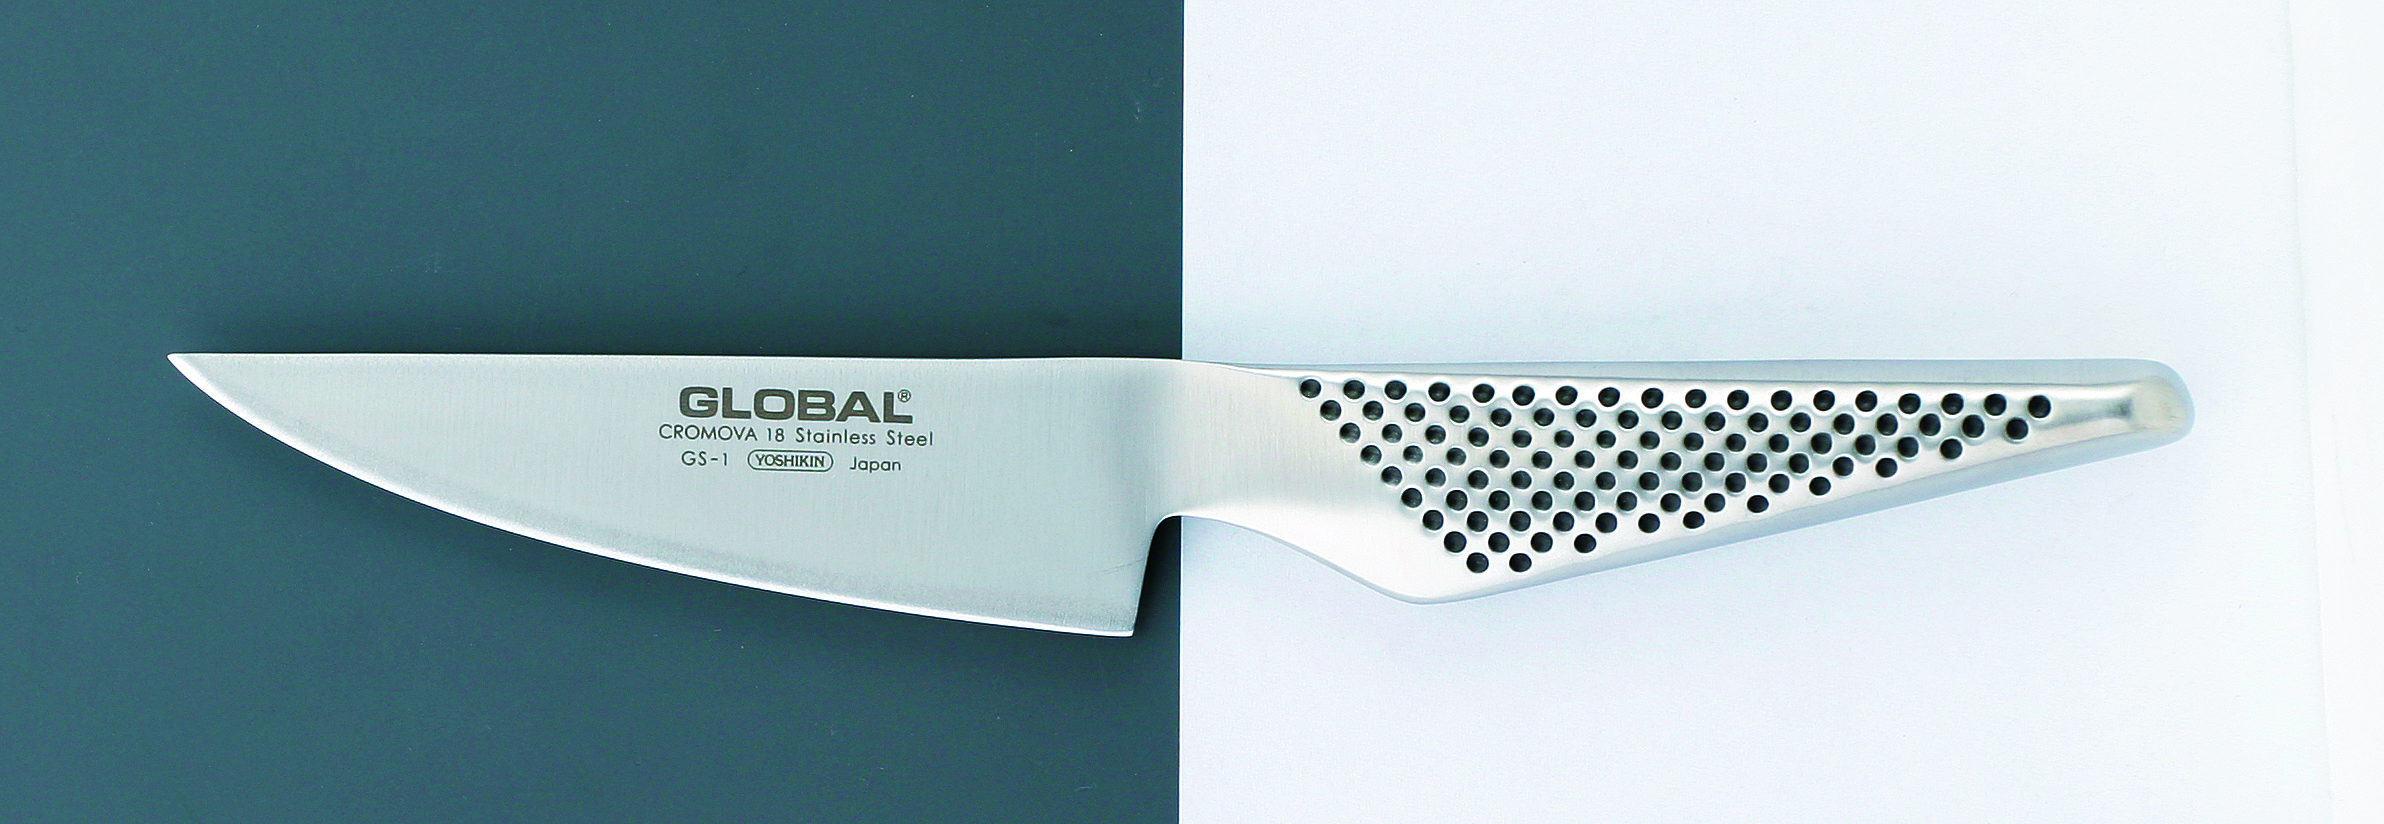 global kitchen knife 11cm gs 1 global kitchen knife 11cm gs 1